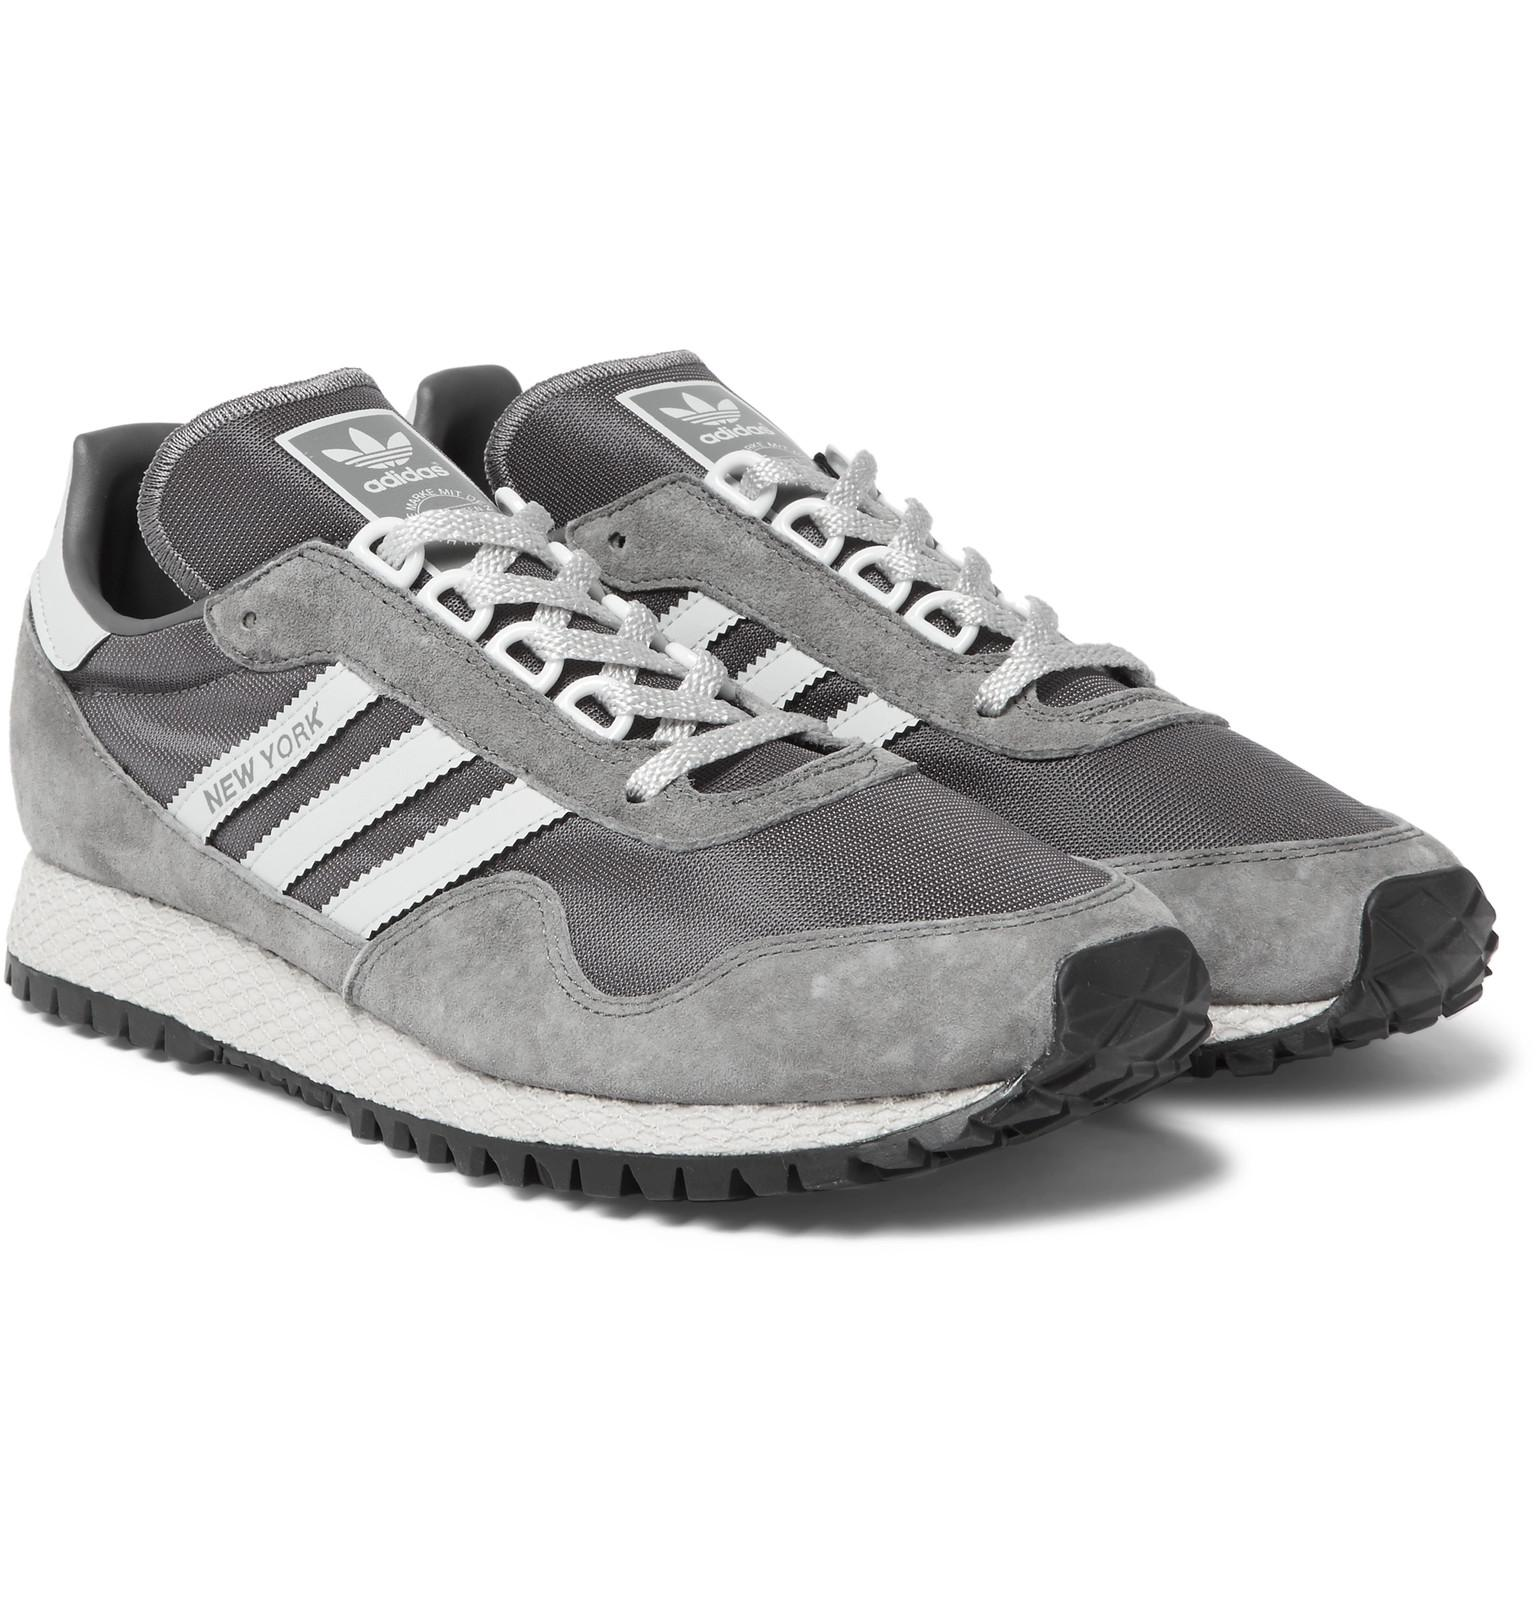 lyst adidas originali di new york e scarpe da ginnastica in maglia grigia nabuk